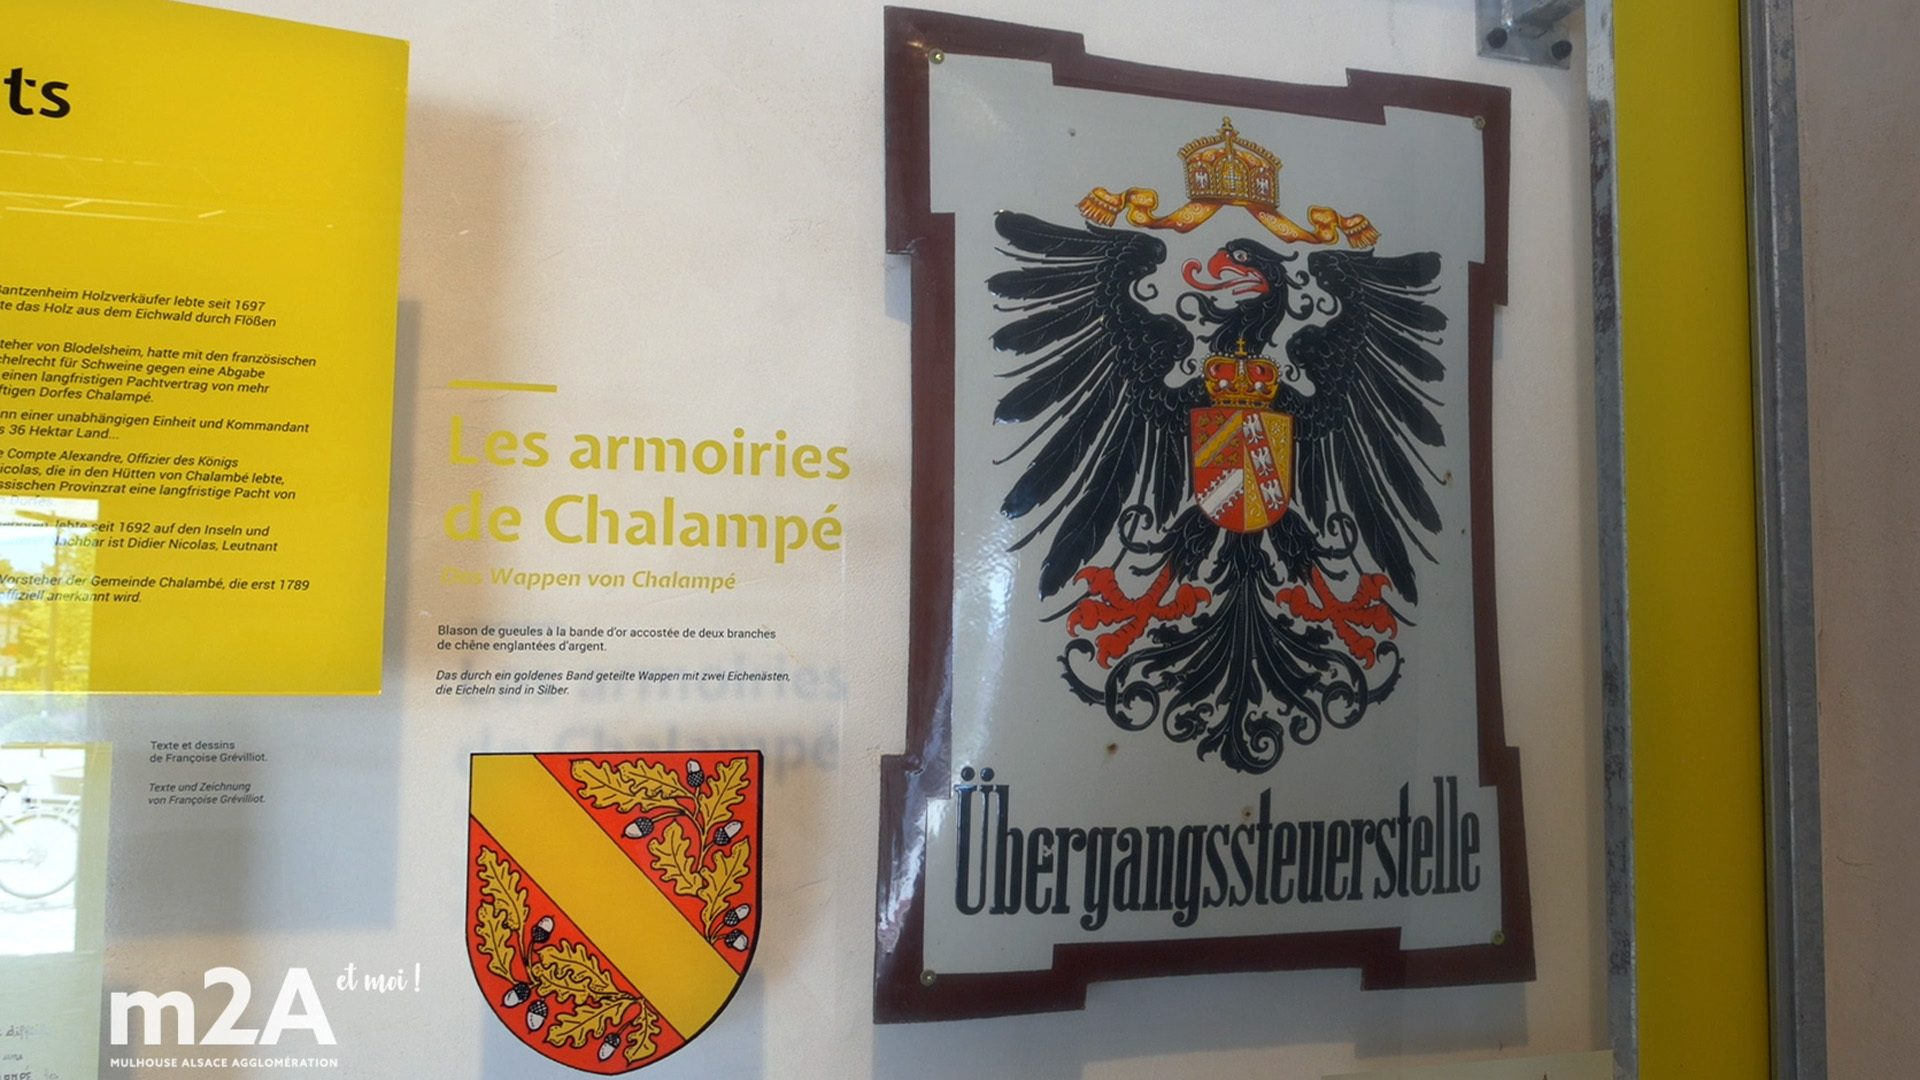 Armoiries de Chalampé